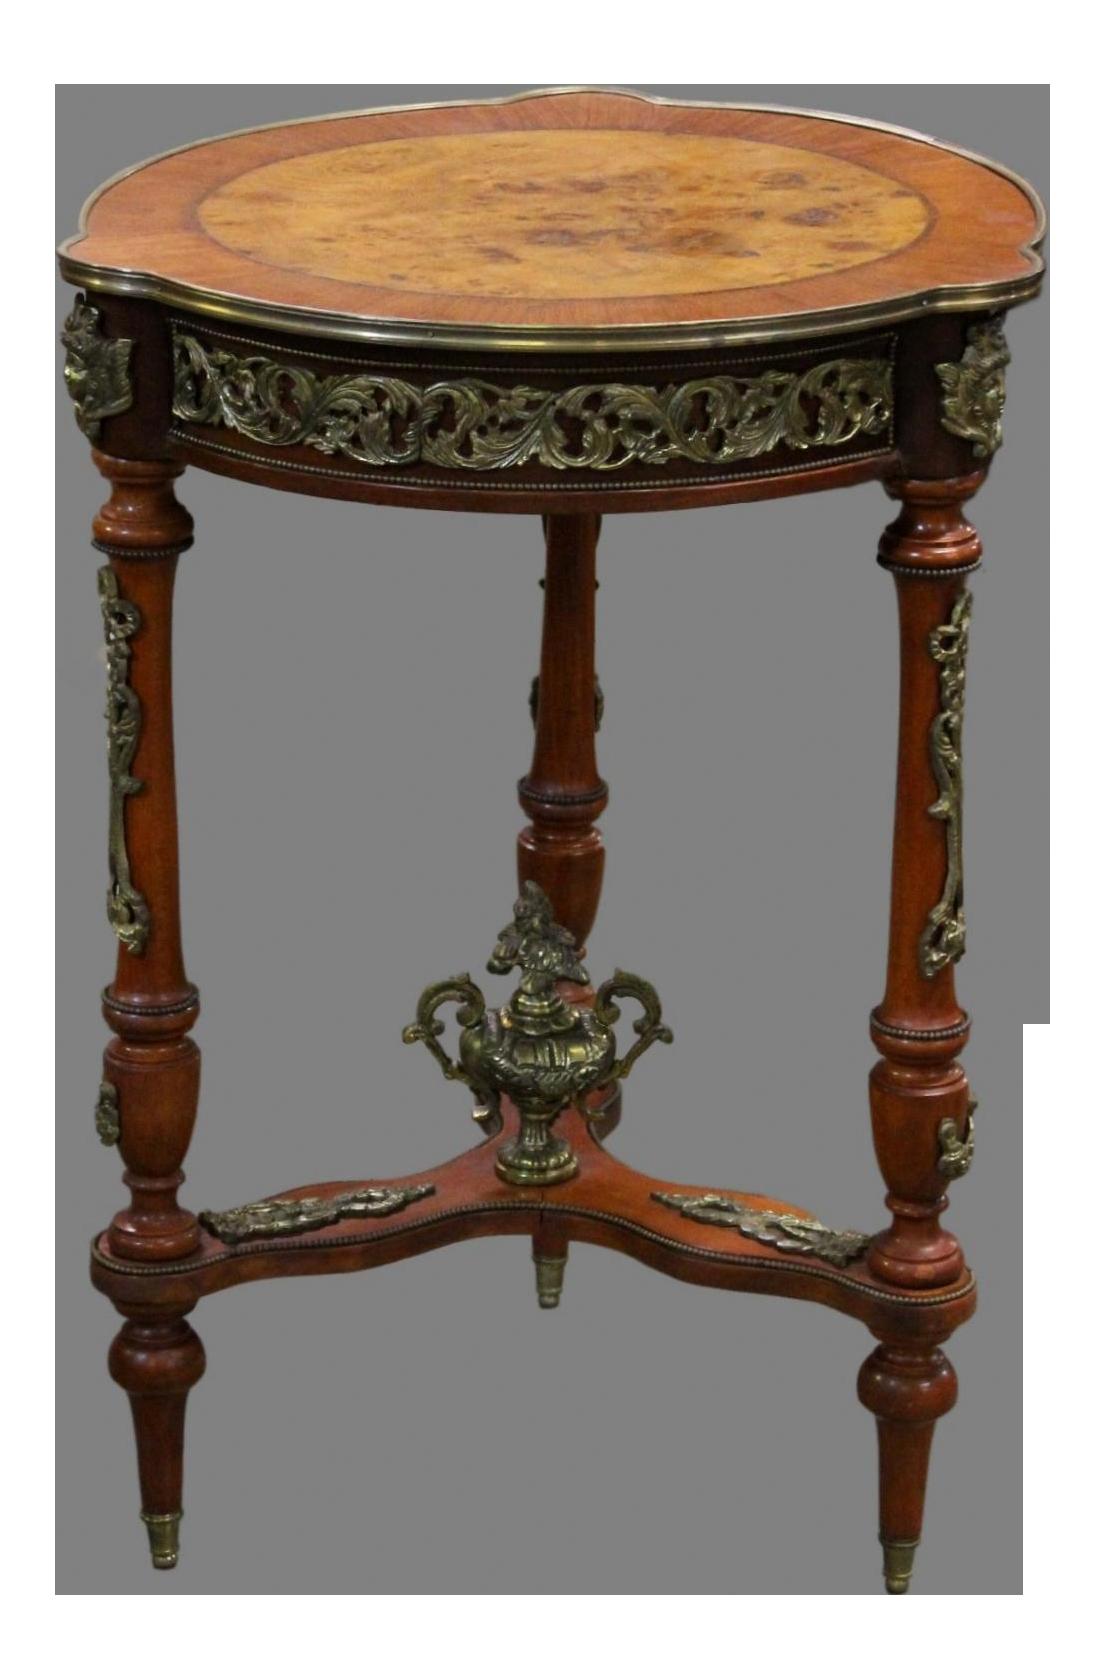 Vintage French Louis XVI Regal Empire Style Ornate Brass Ormolu Walnut Side  Table